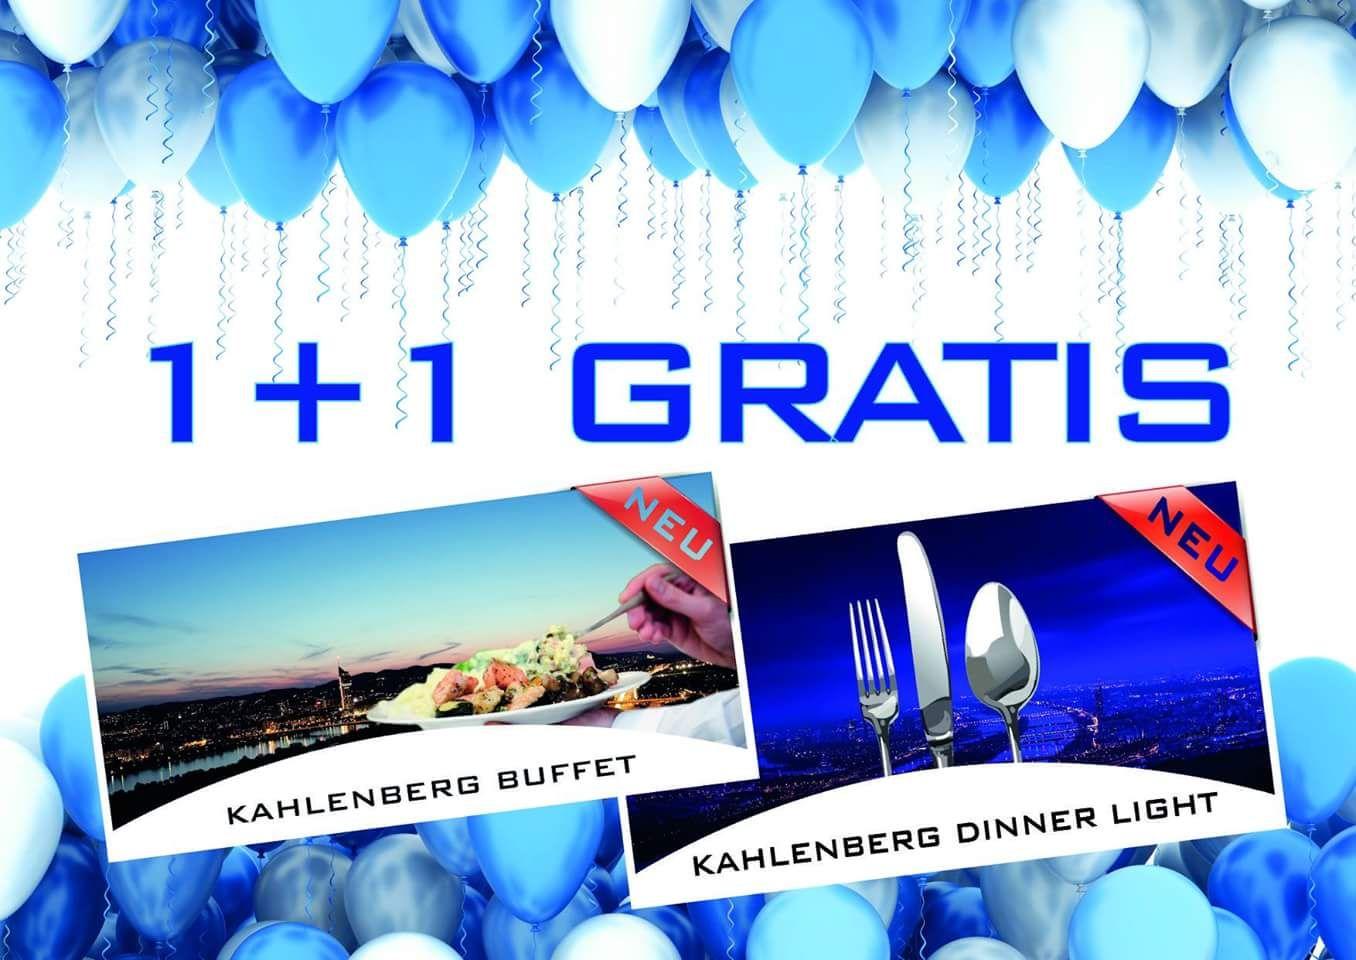 1+1 Gratis auf Kahlenberg Buffet und Kahlenberg Dinner Light